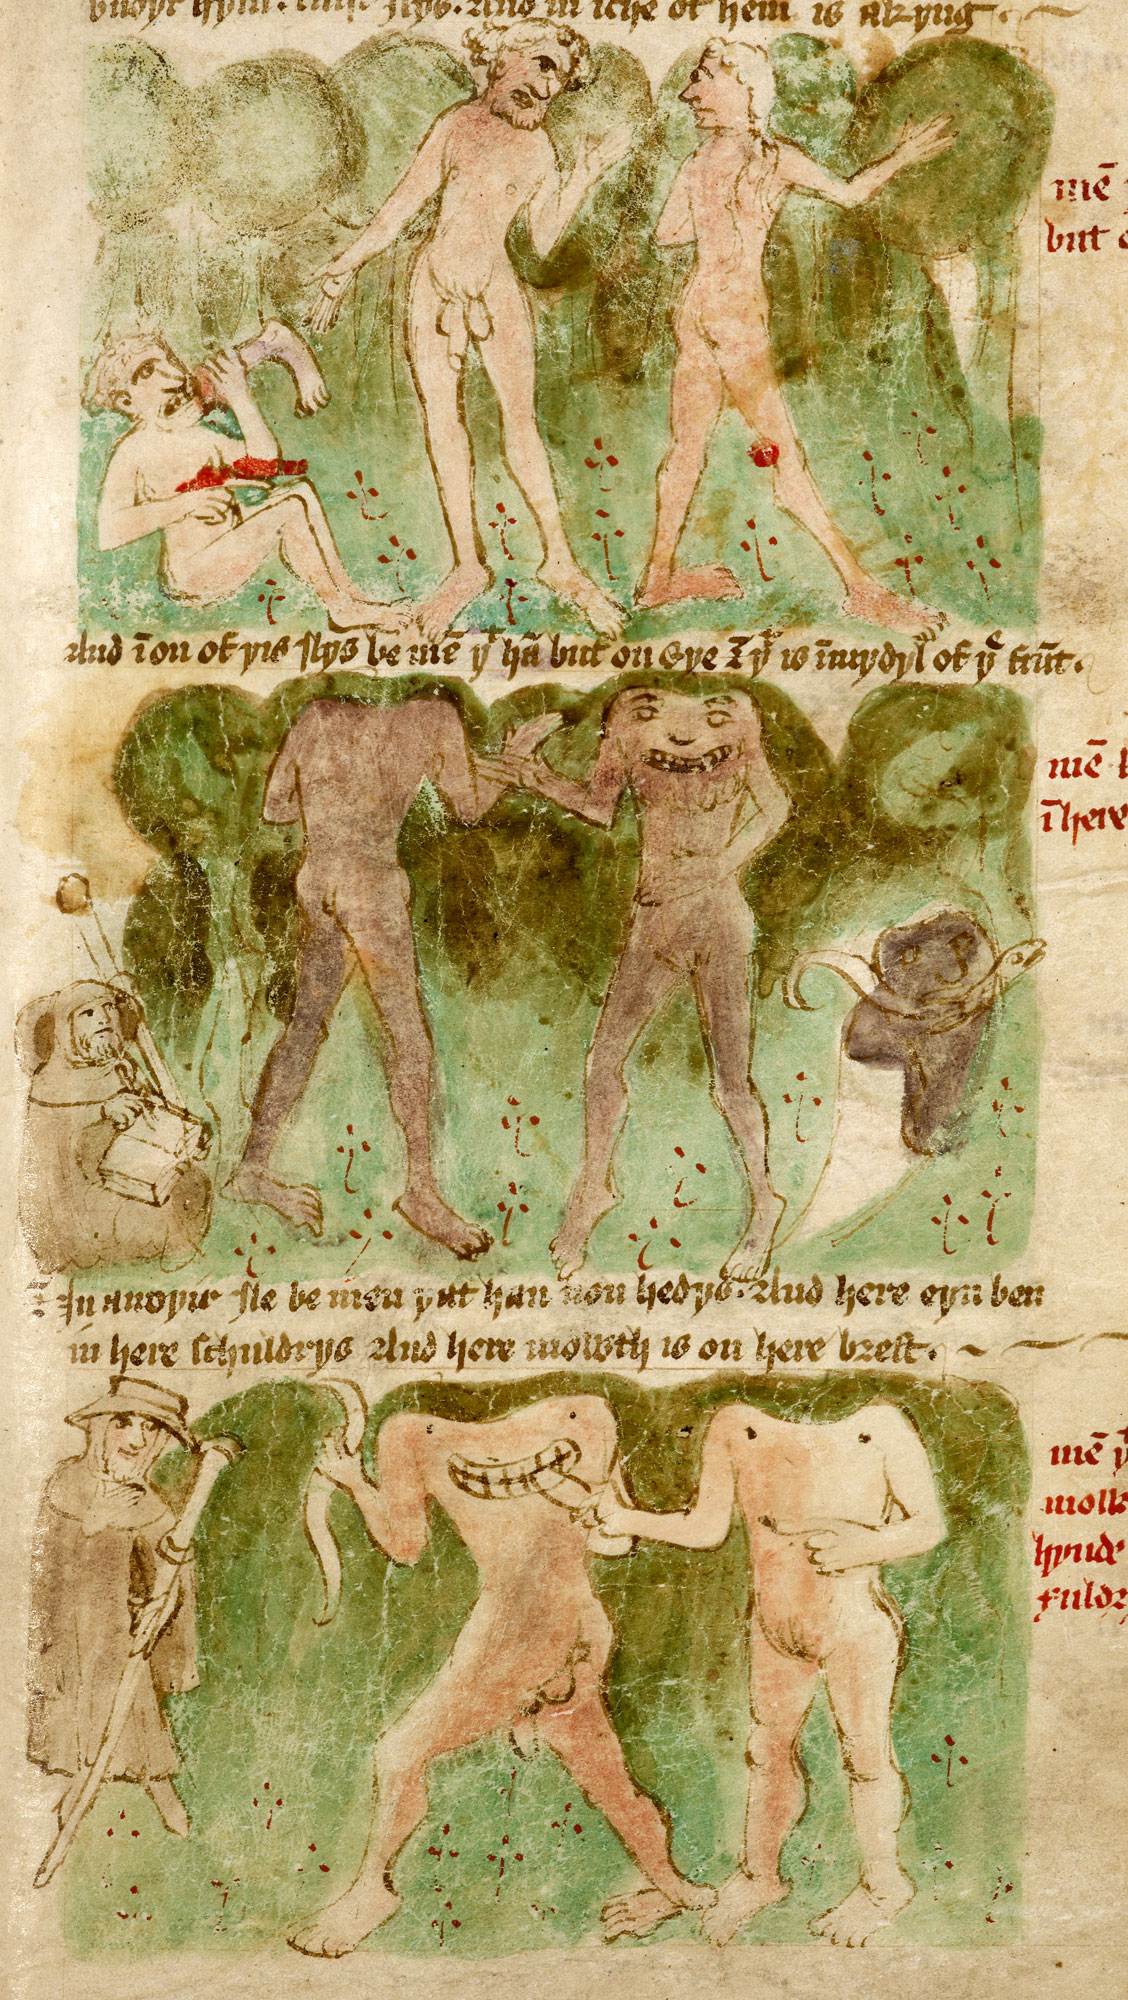 Manuscript of Mandeville's Travels showing headless men, 1430